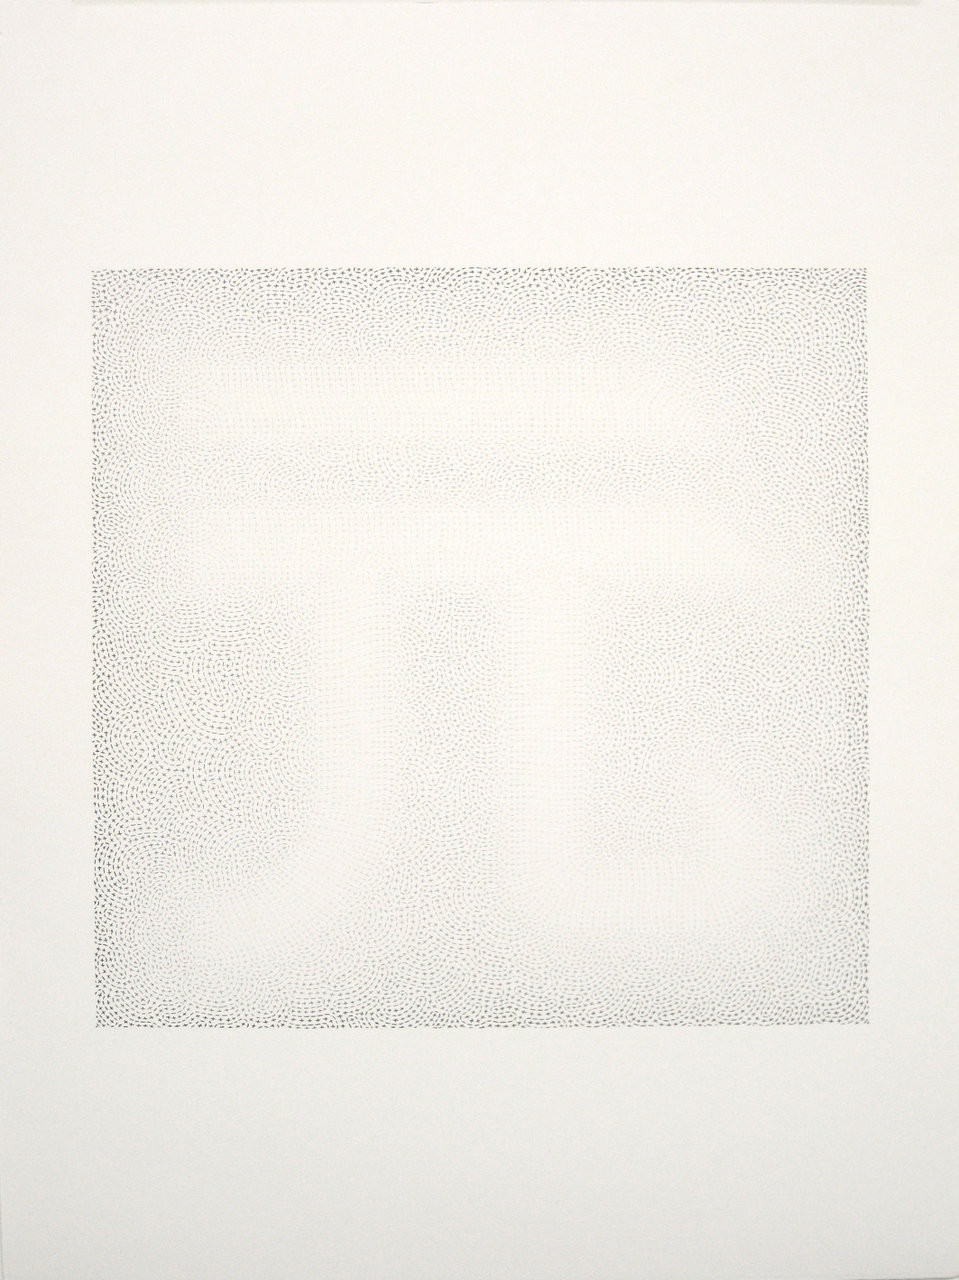 CNY, Pencil on paper, 700 mm x 500 mm